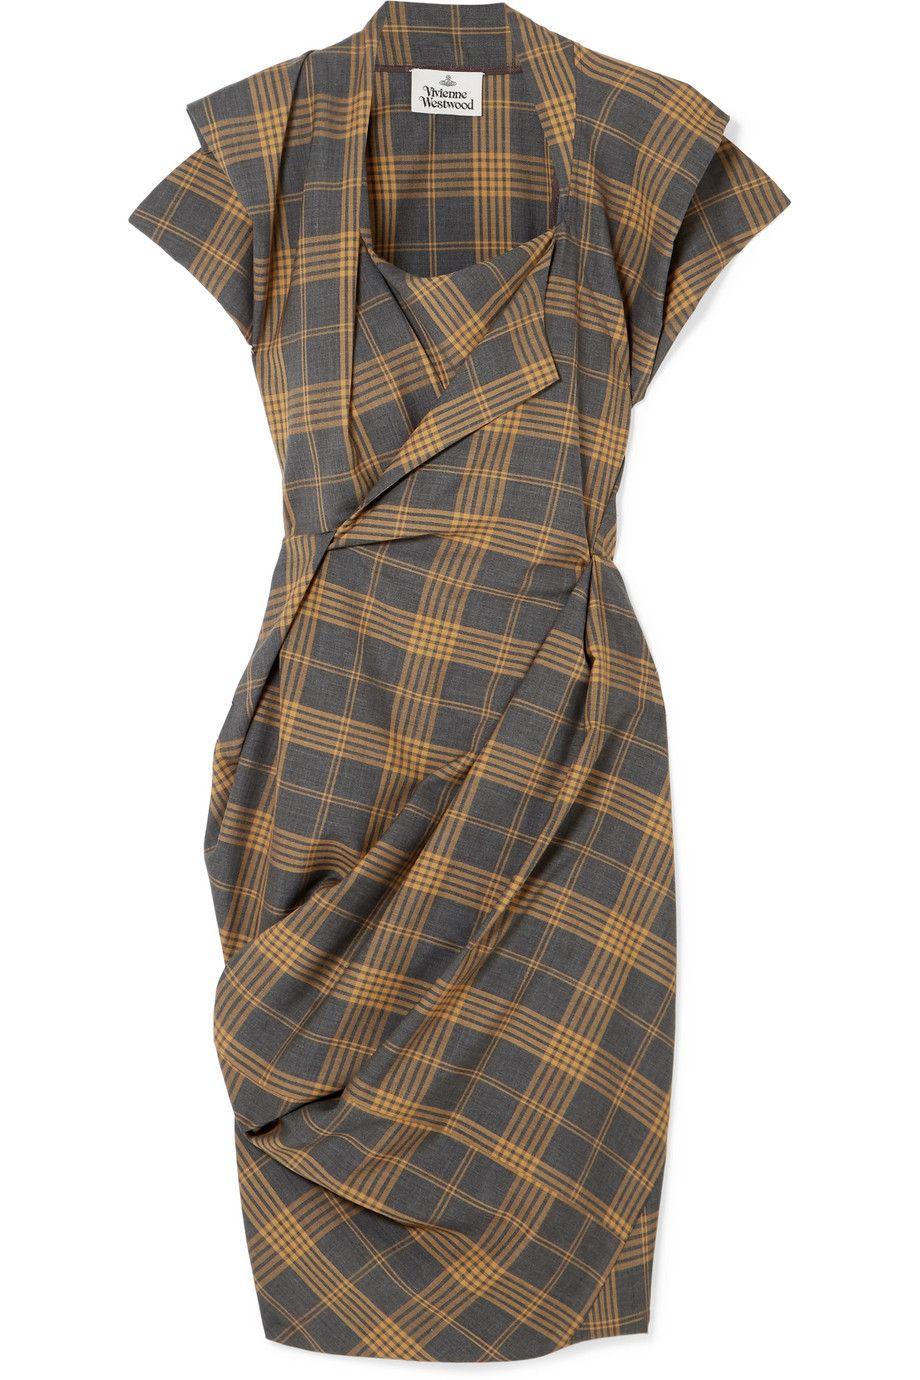 Vivienne Westwood  Grand Fond draped tartan wool dress  NET-A